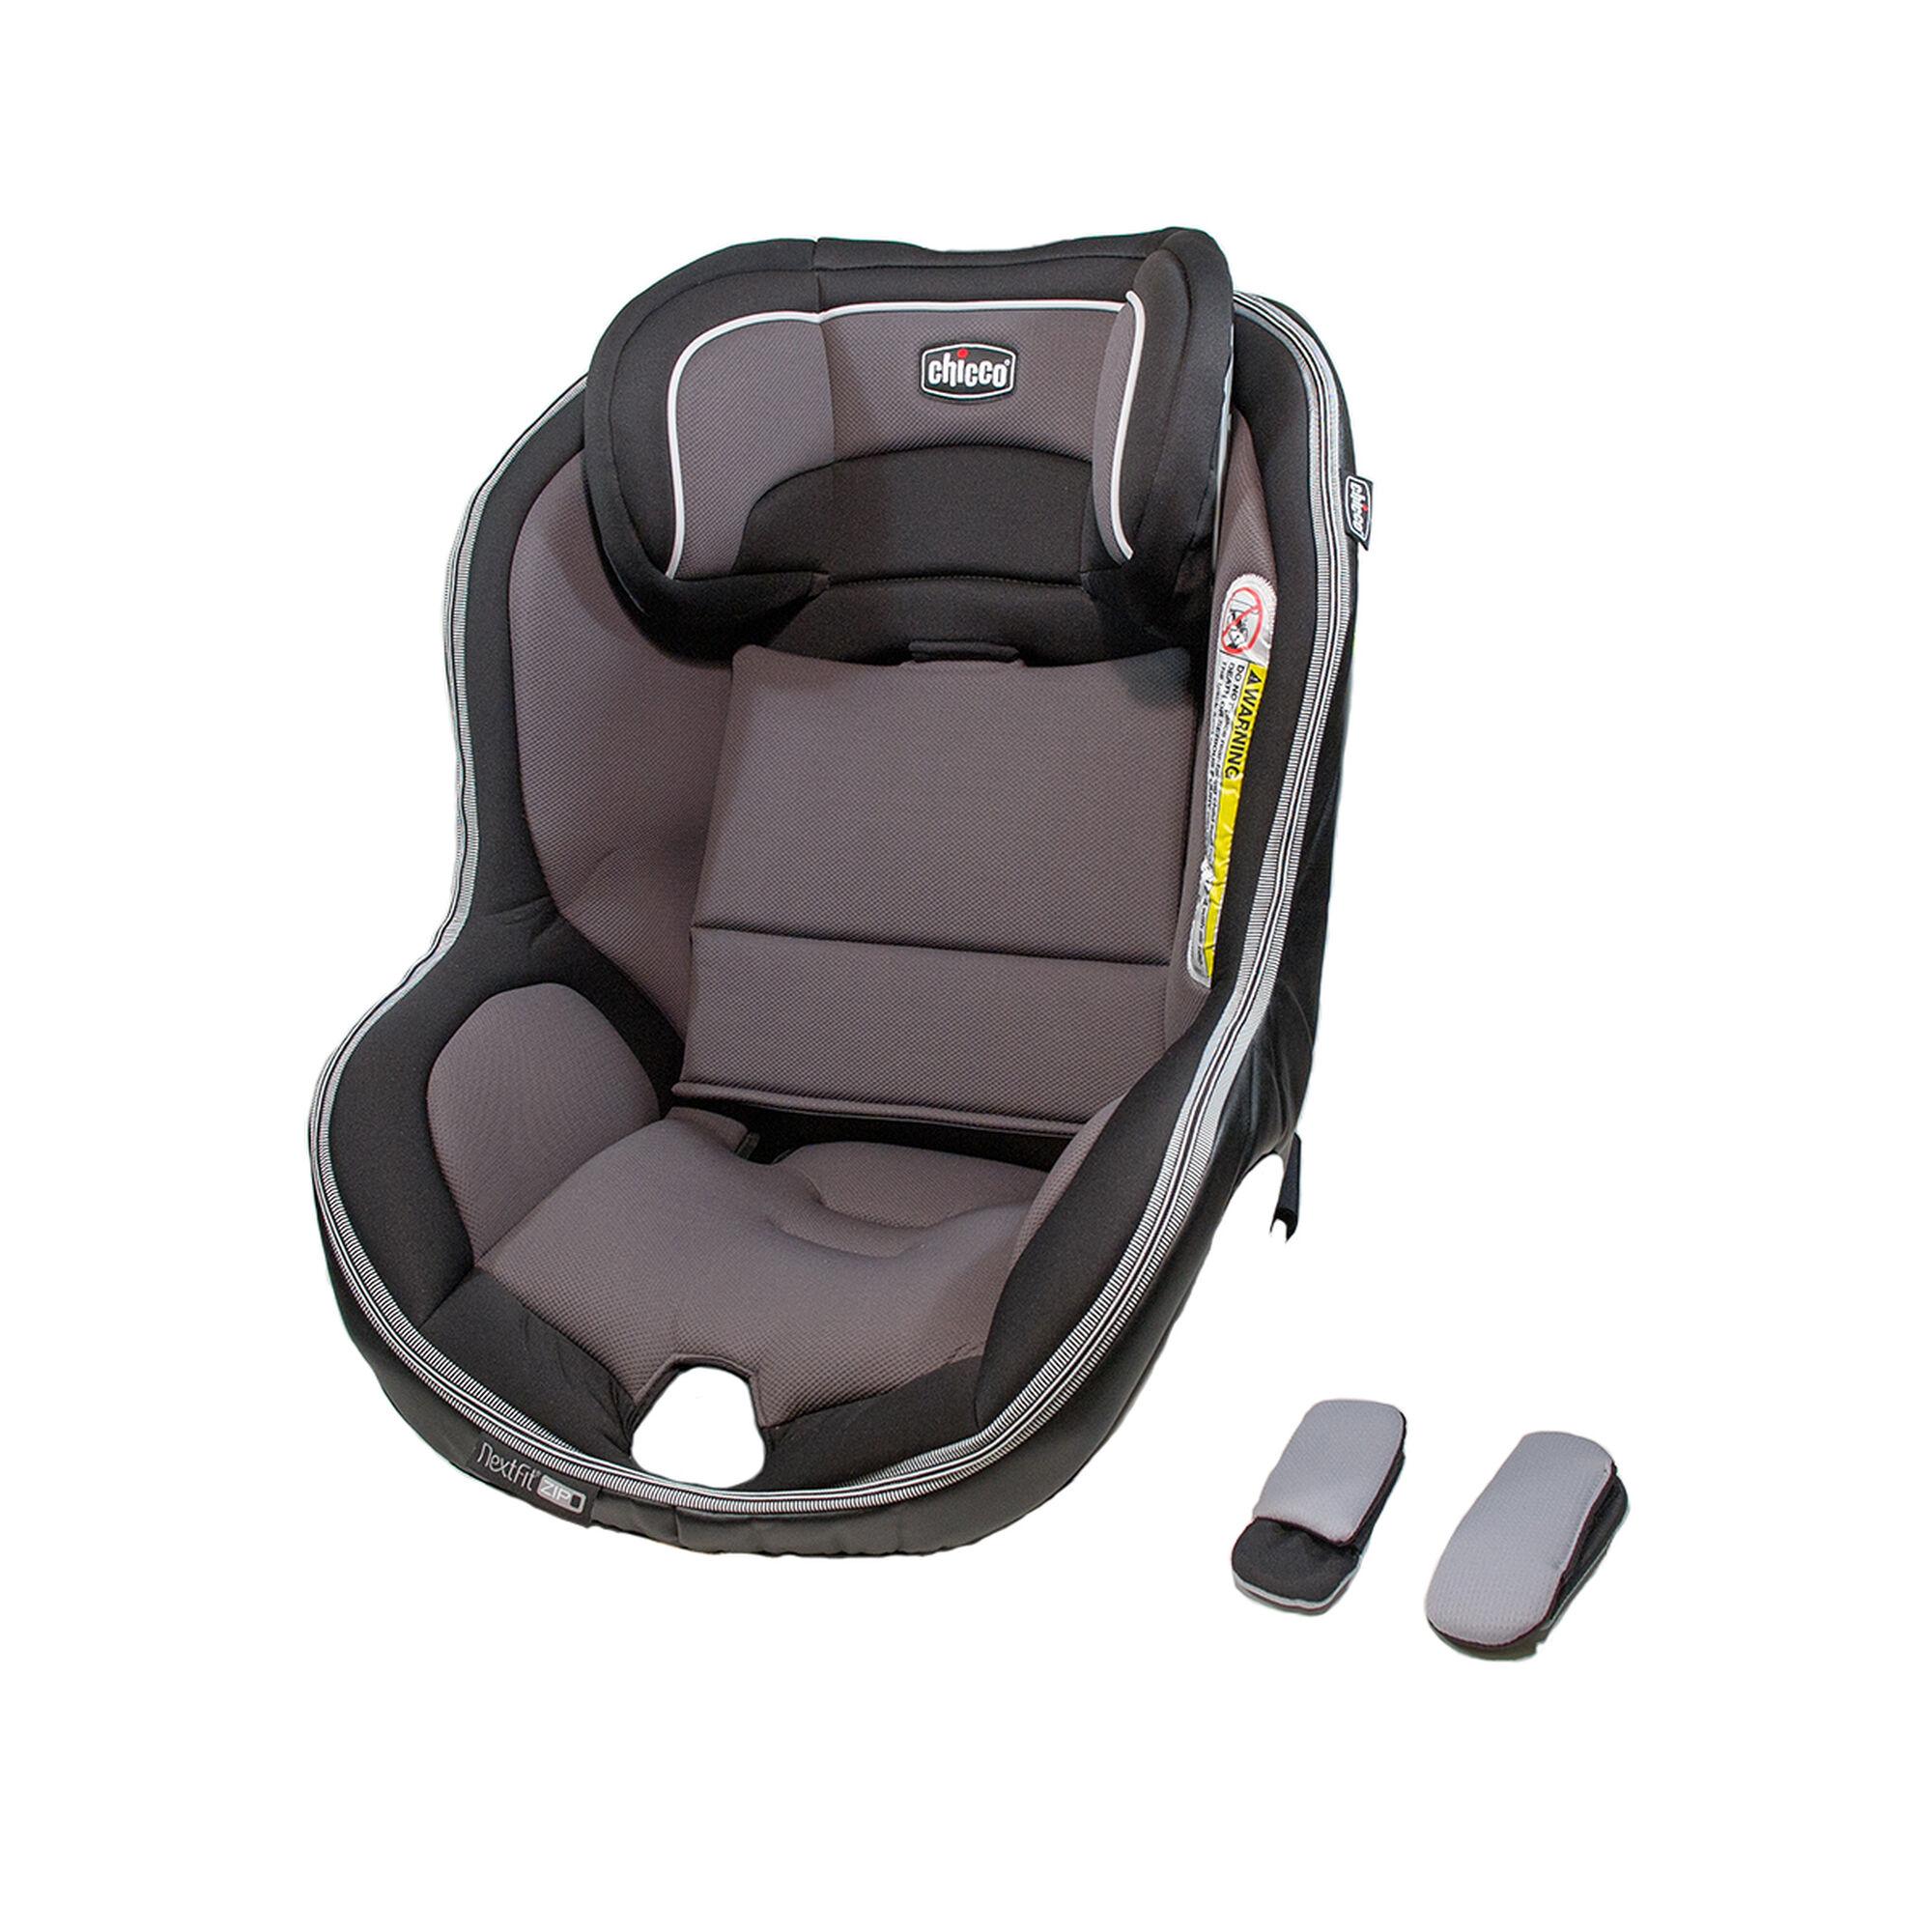 chico car seat cover velcromag. Black Bedroom Furniture Sets. Home Design Ideas